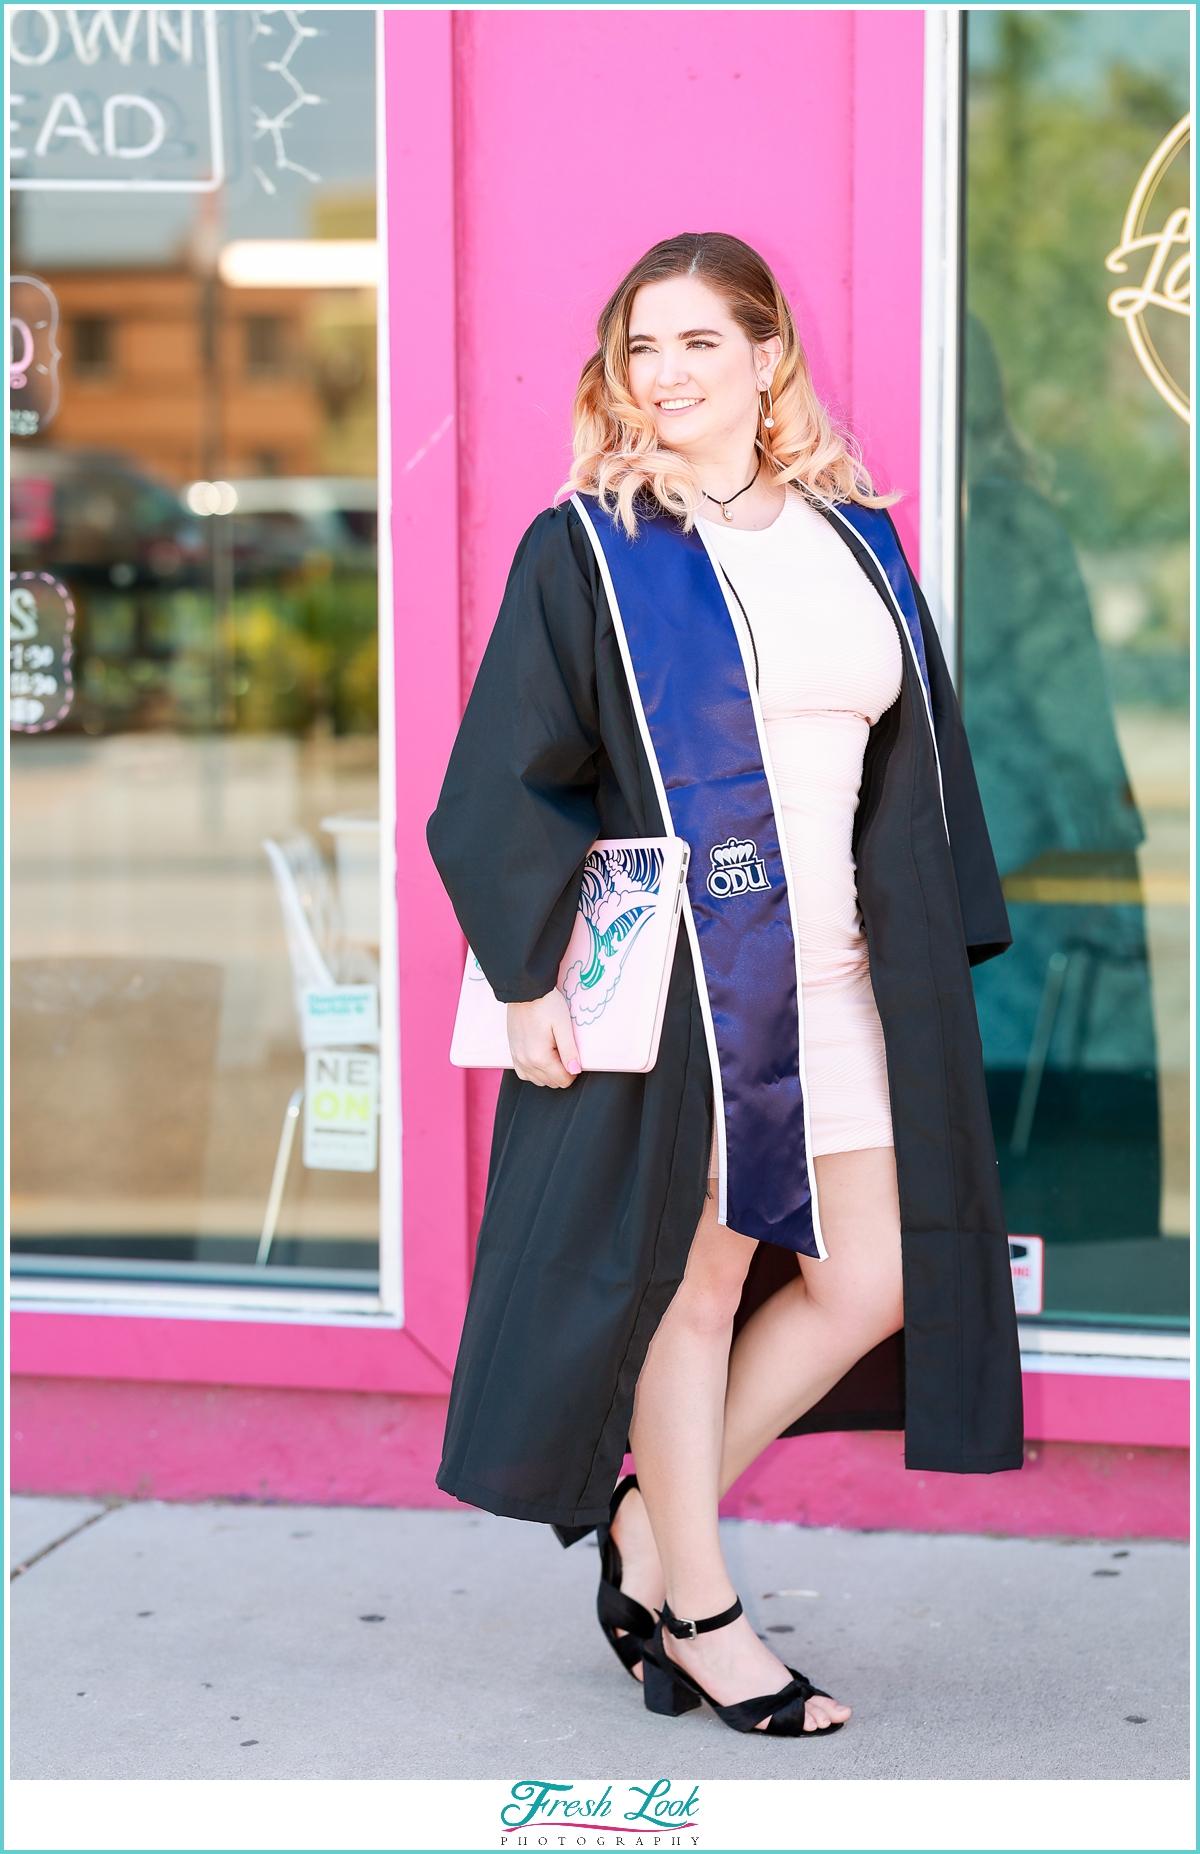 ODU Senior Graduation Photographer